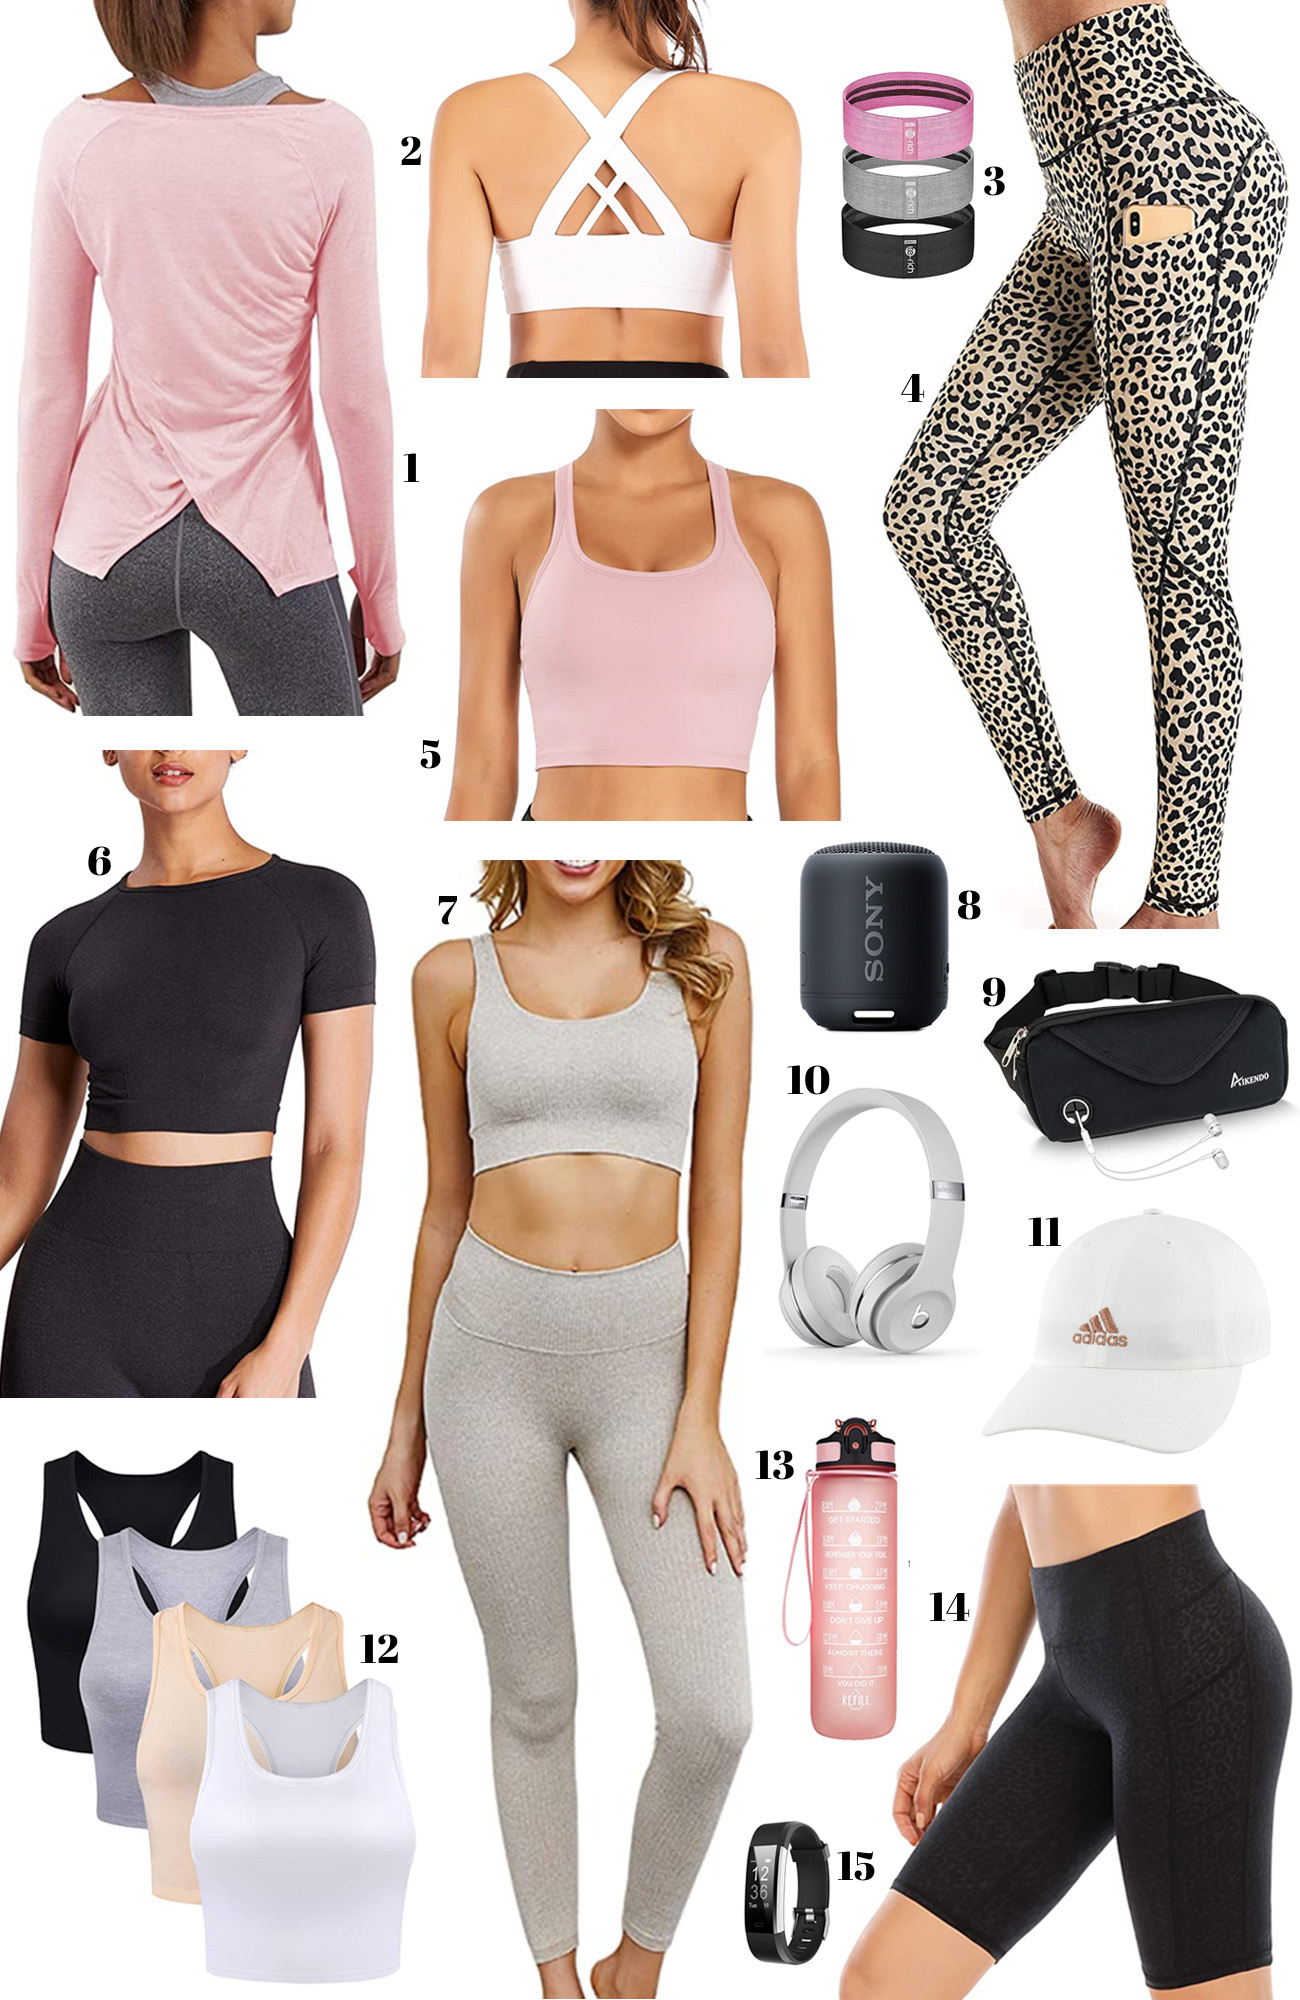 workout clothing   athleisure   workout clothes   running shirt   sports bra   yoga pants   yoga mat